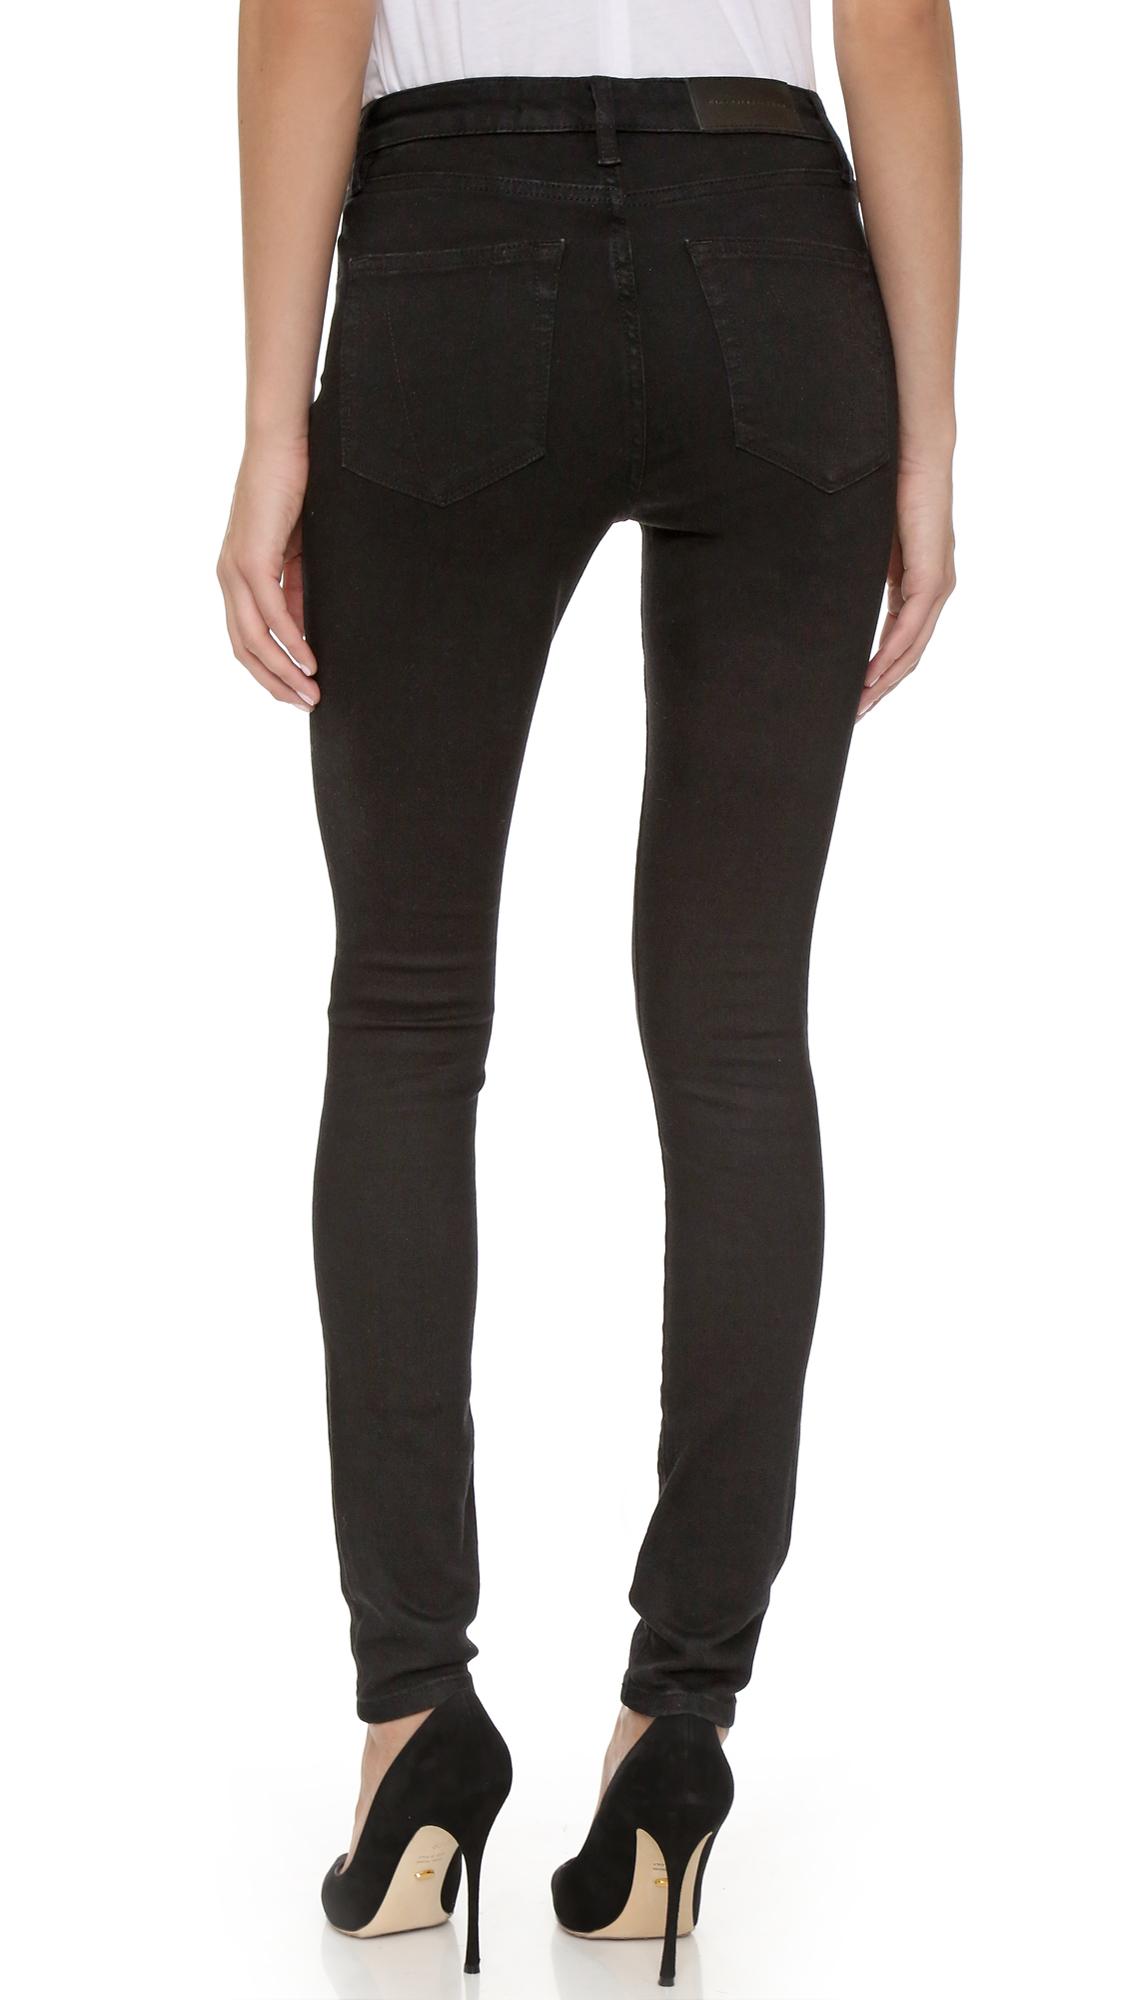 victoria victoria beckham power high jeans in black lyst. Black Bedroom Furniture Sets. Home Design Ideas